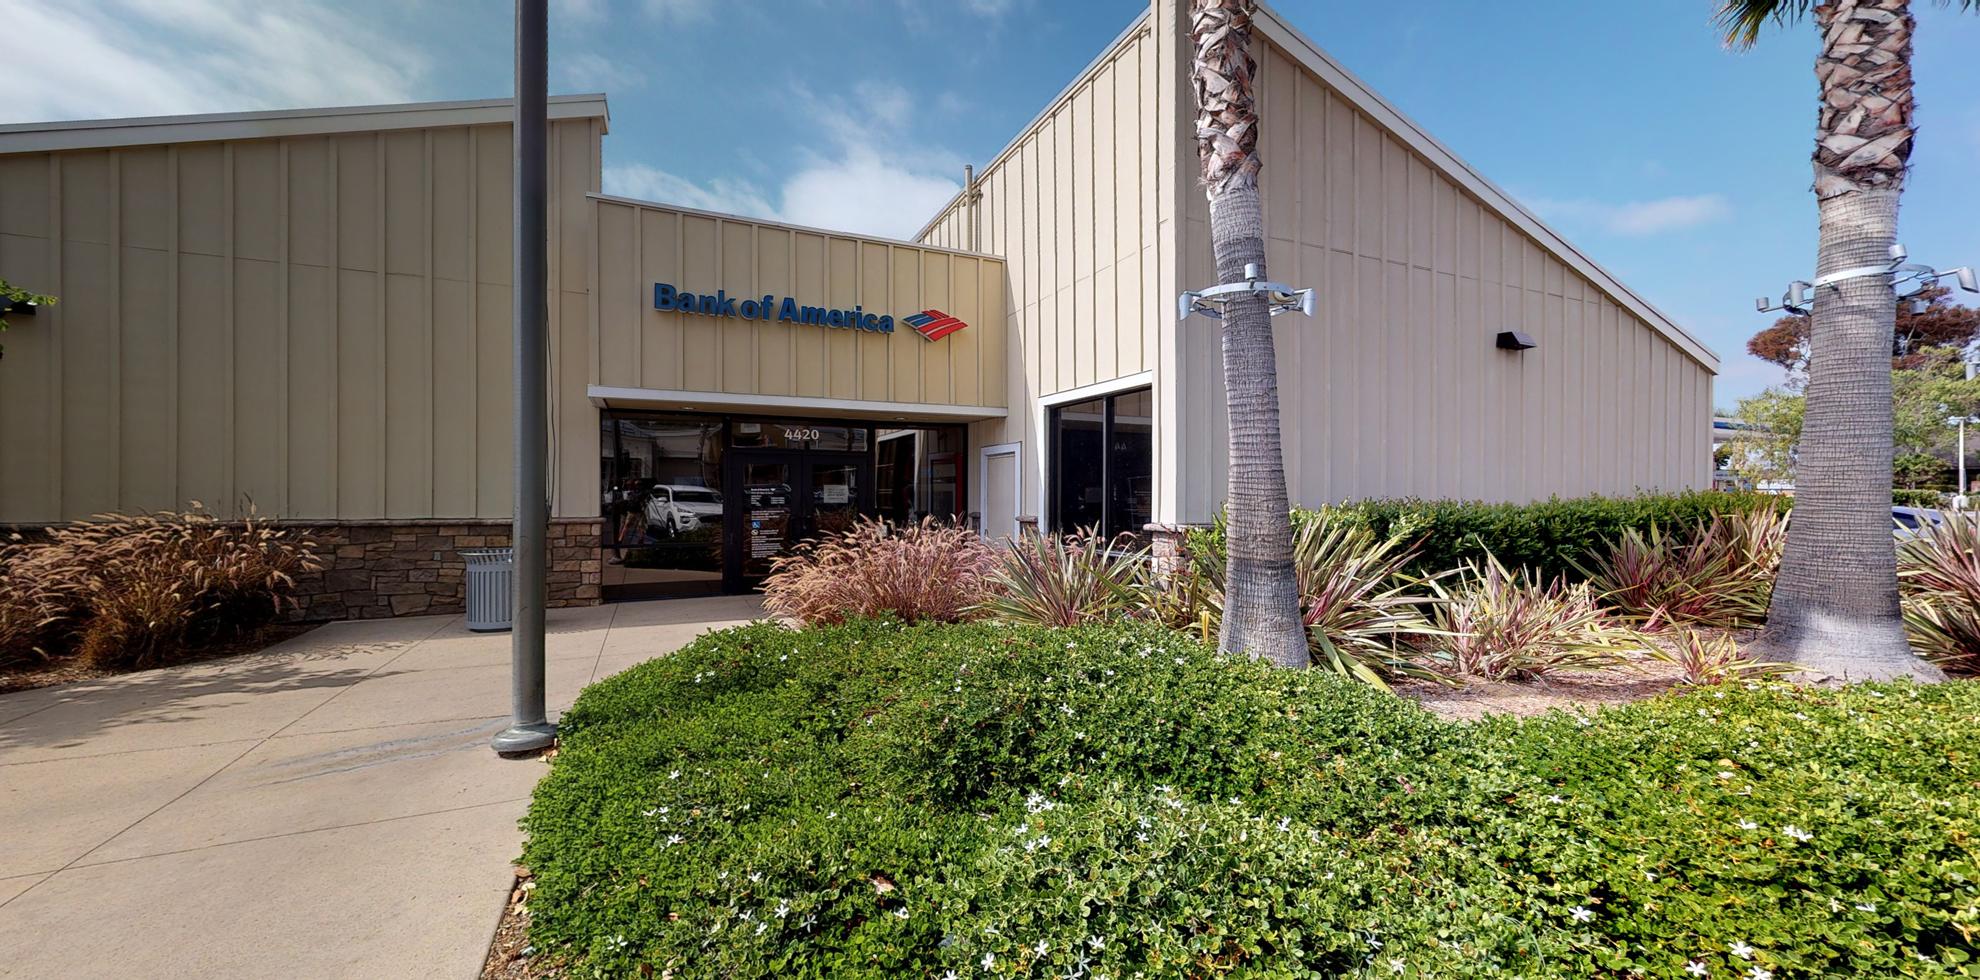 Bank of America financial center with drive-thru ATM   4420 Bonita Rd, Bonita, CA 91902